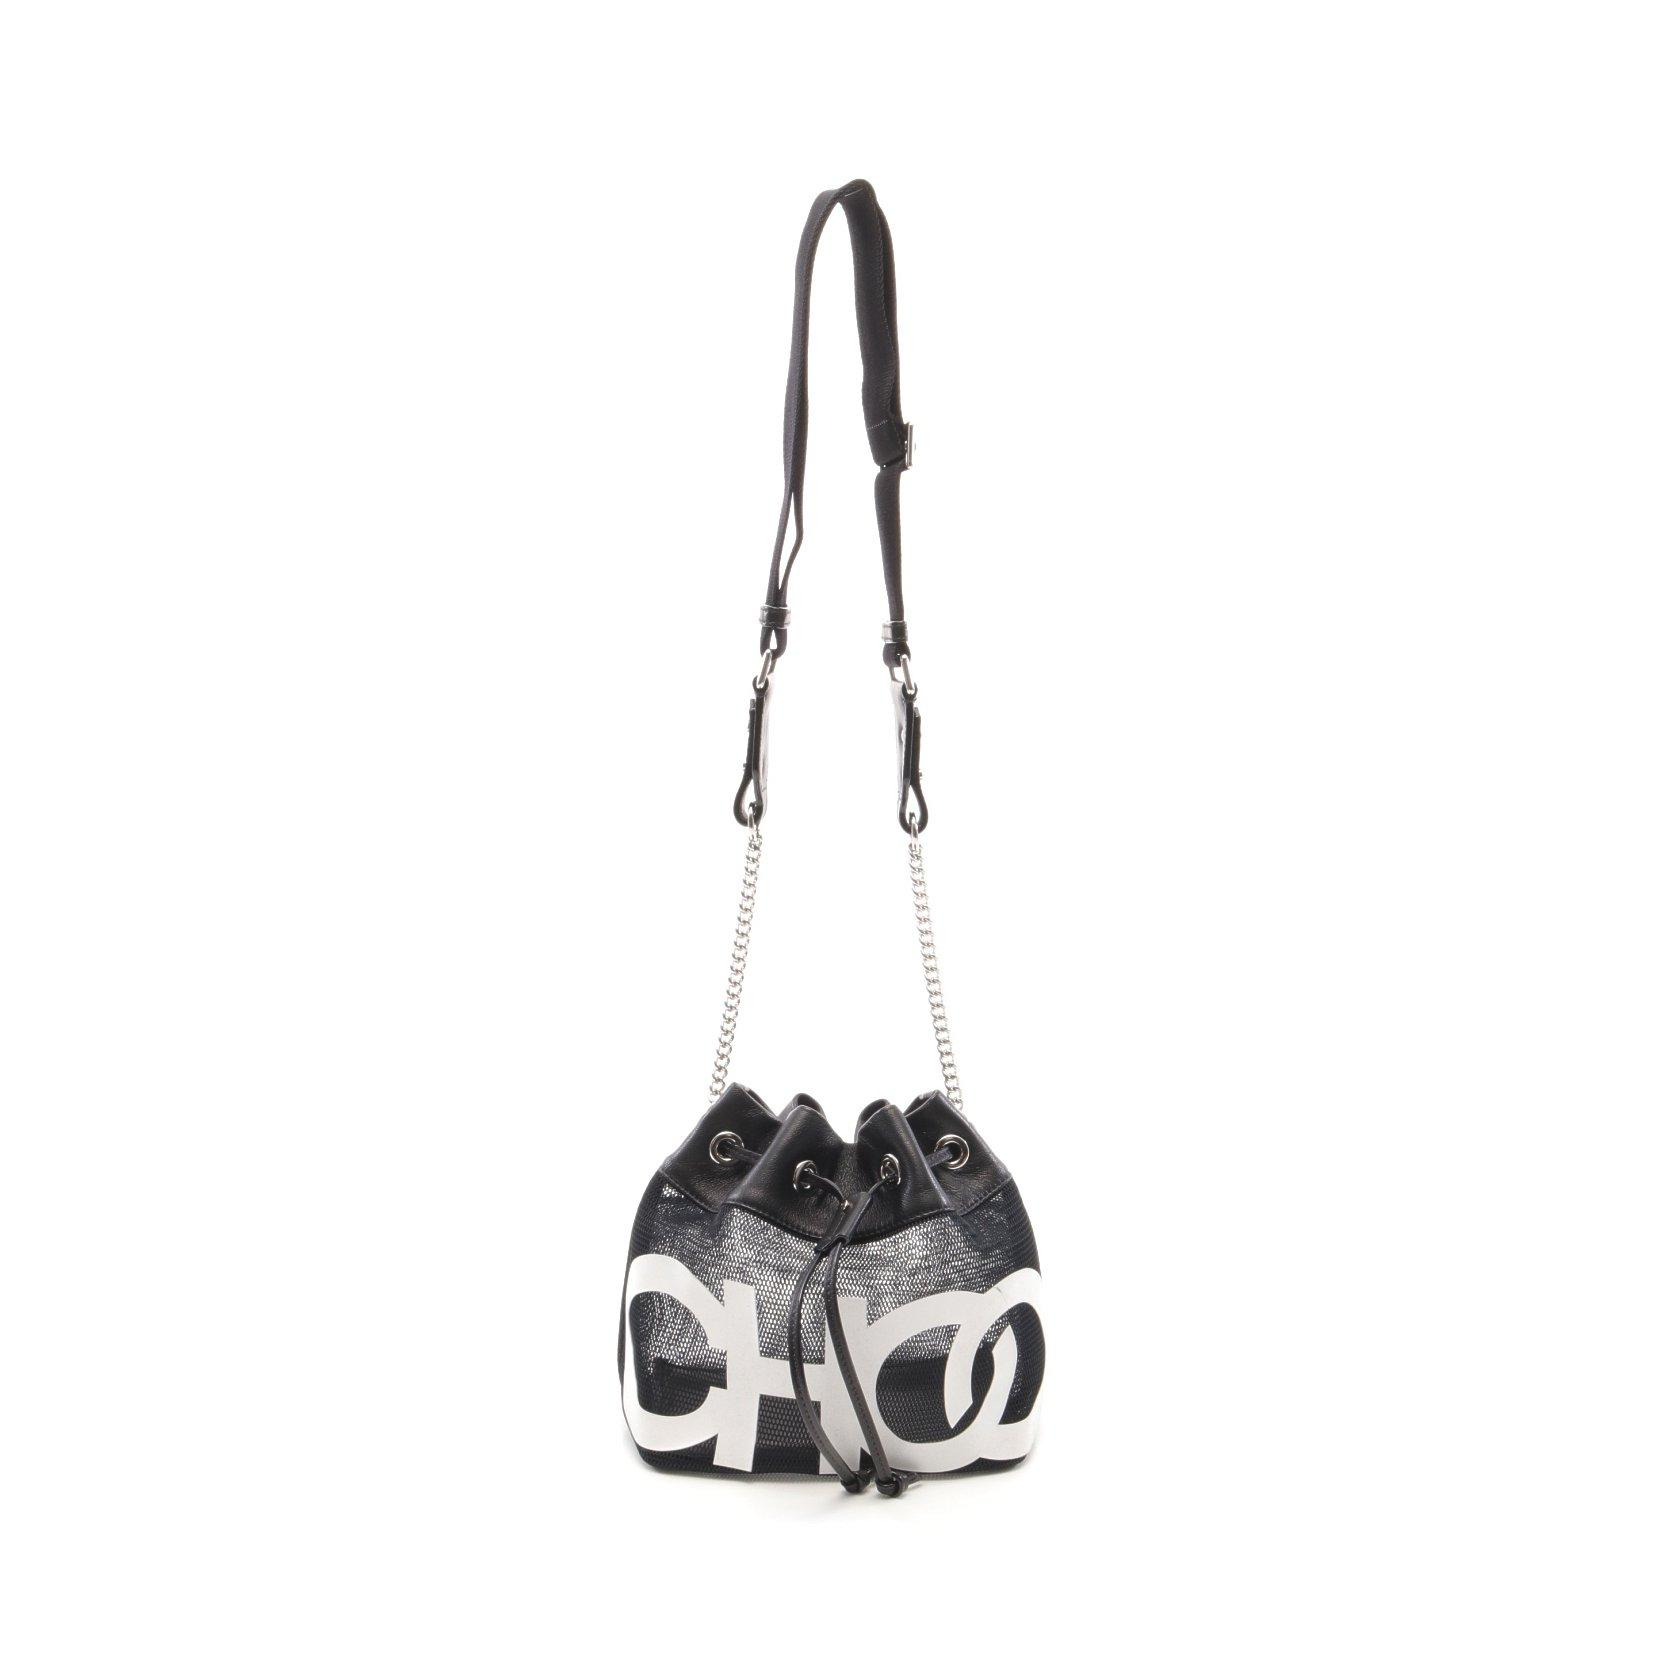 JIMMY CHOO・バッグ・JUNO ジュノ チェーンショルダーバッグ レザー ブラック ホワイト メッシュ CHOOロゴ ドローストリング